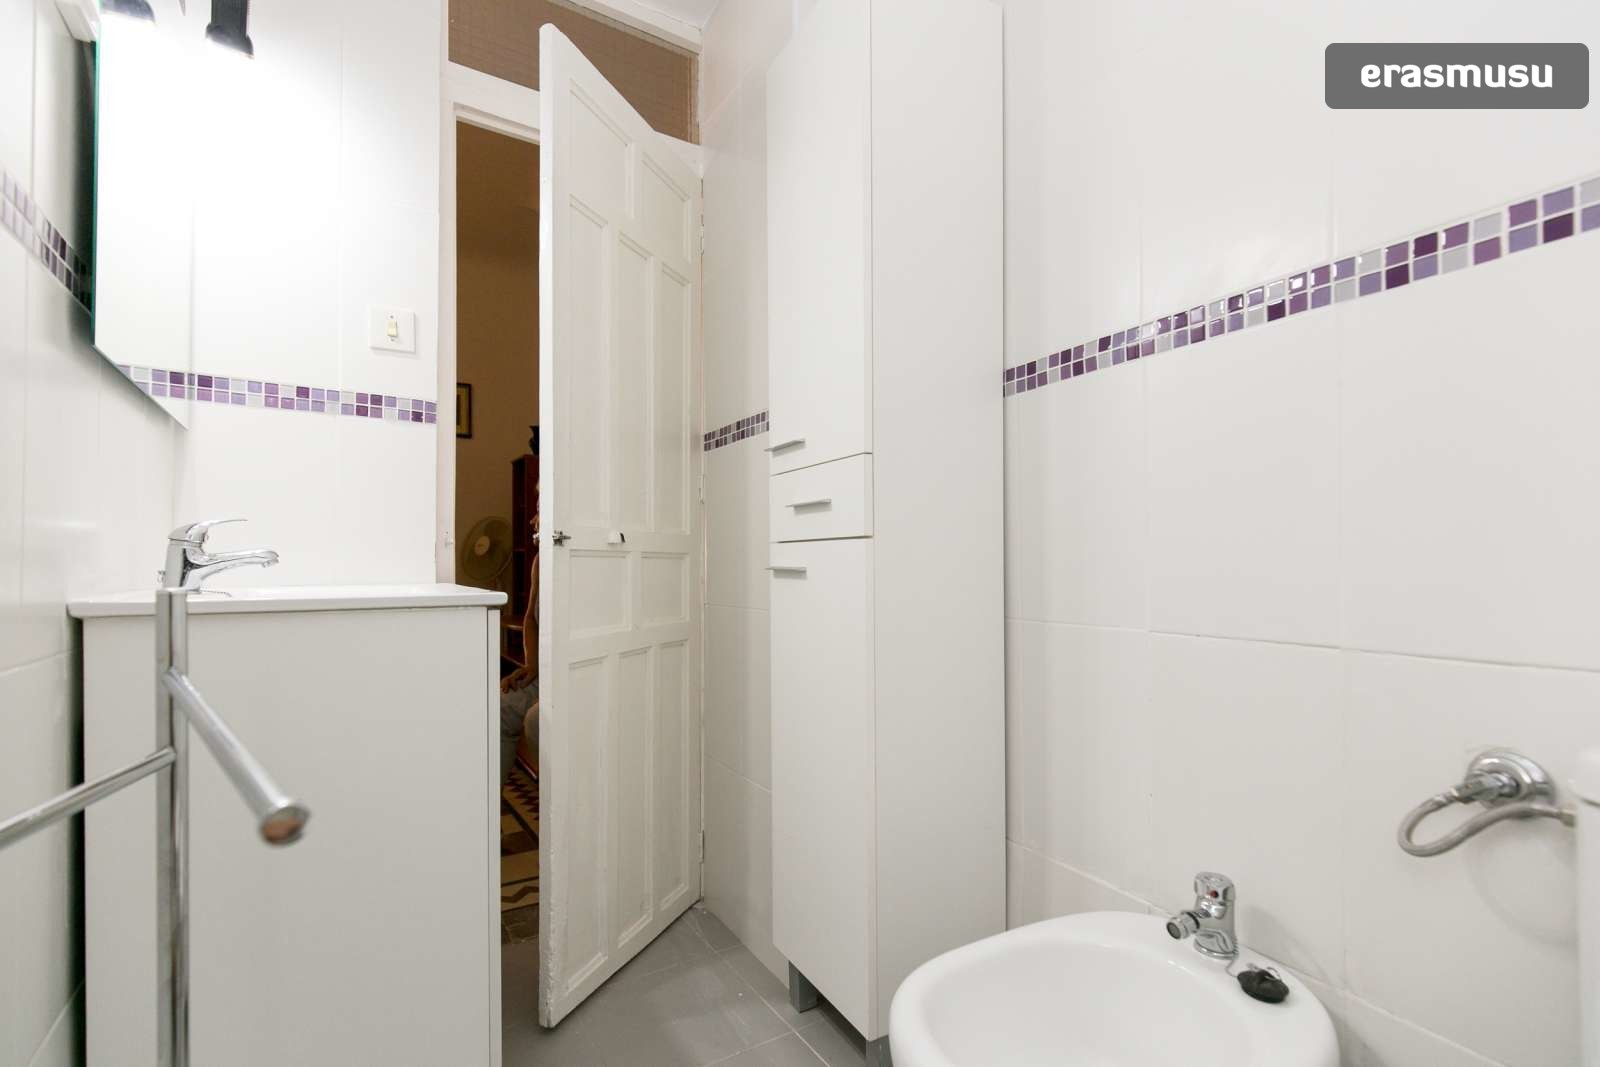 spacious-3-bedroom-apartment-rent-realejo-21ef3b31331fac21e34c9a